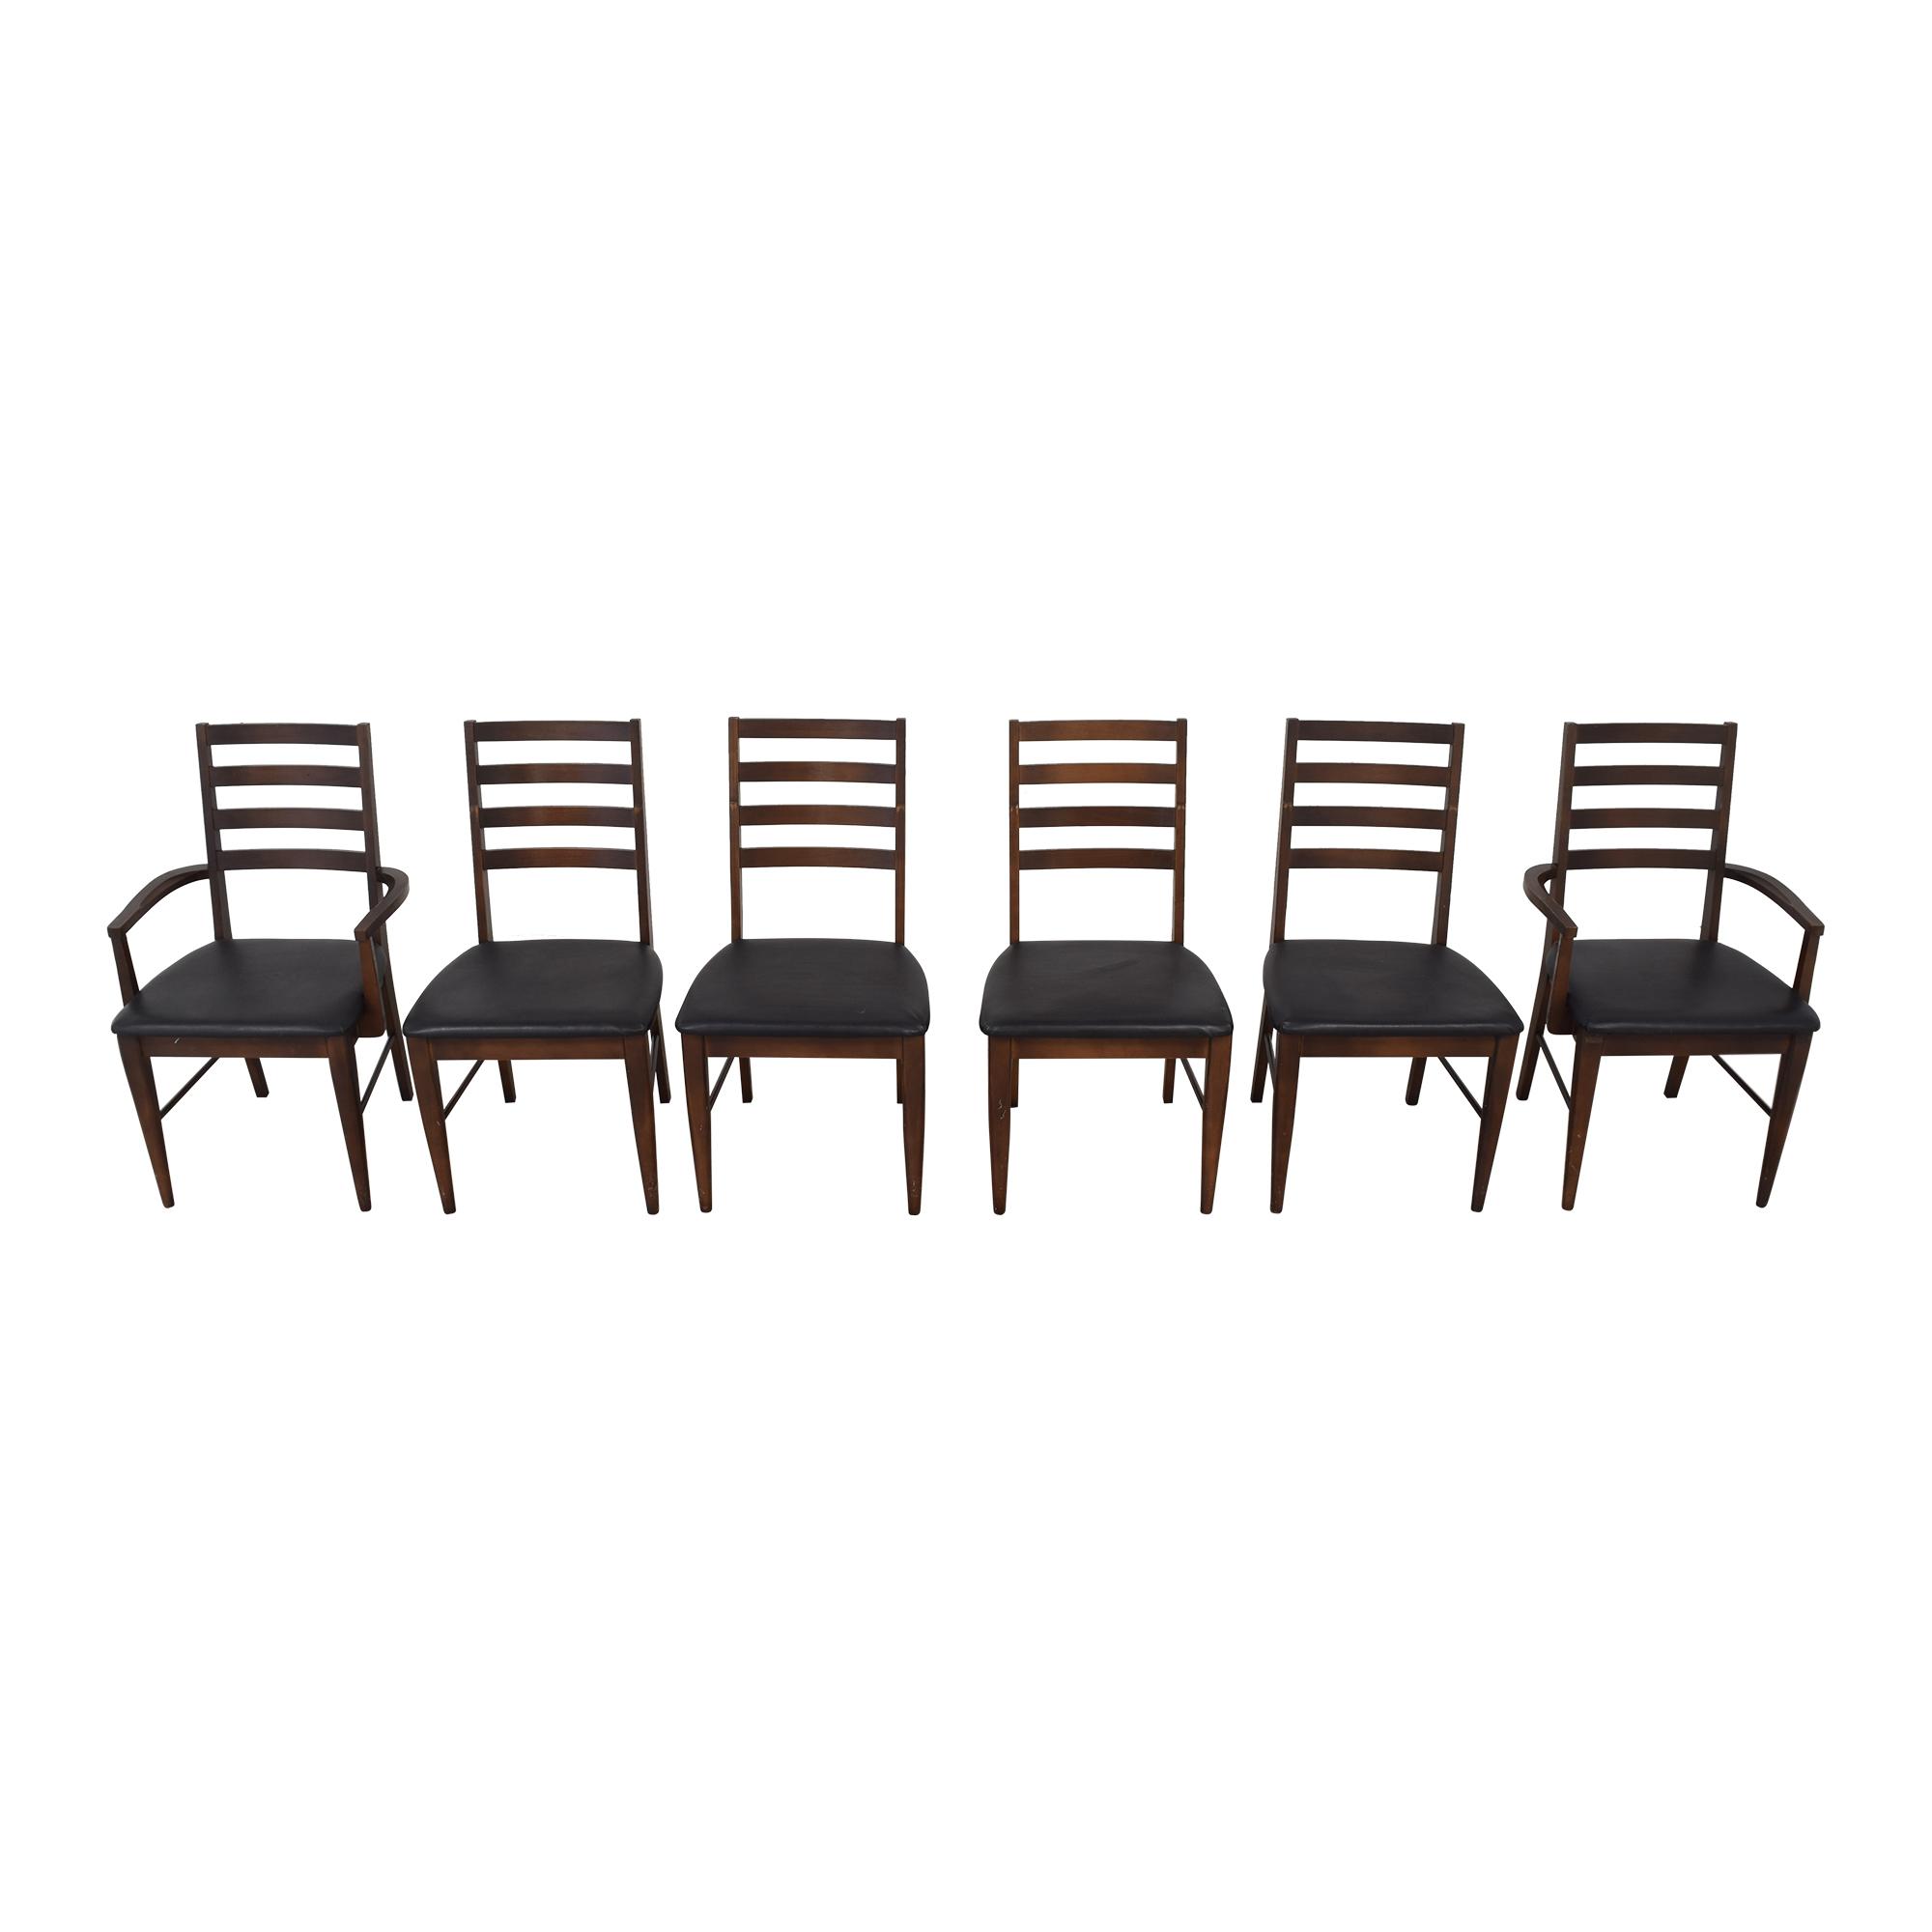 Lenoir Chair Company Lenoir Dining Chairs price